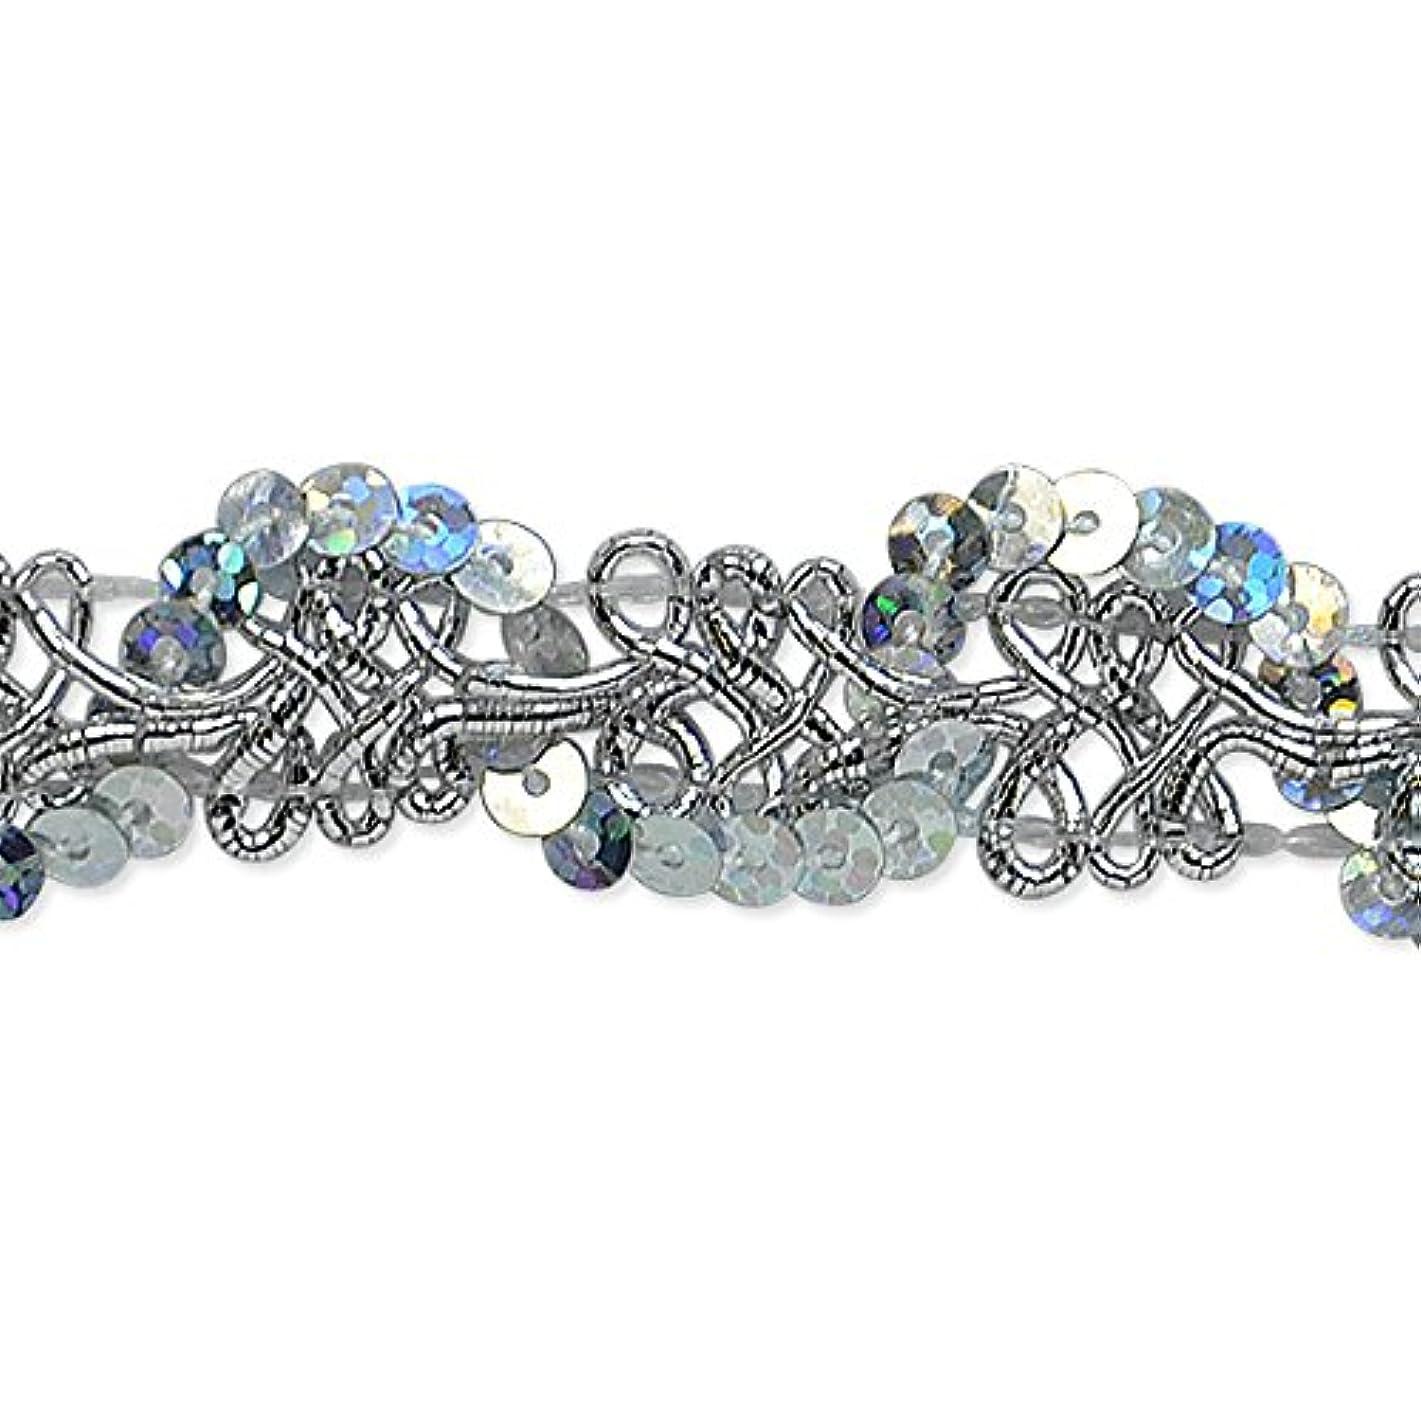 Expo International Lila Sequin Loop Braid Trim Embellishment, 20-Yard, Silver